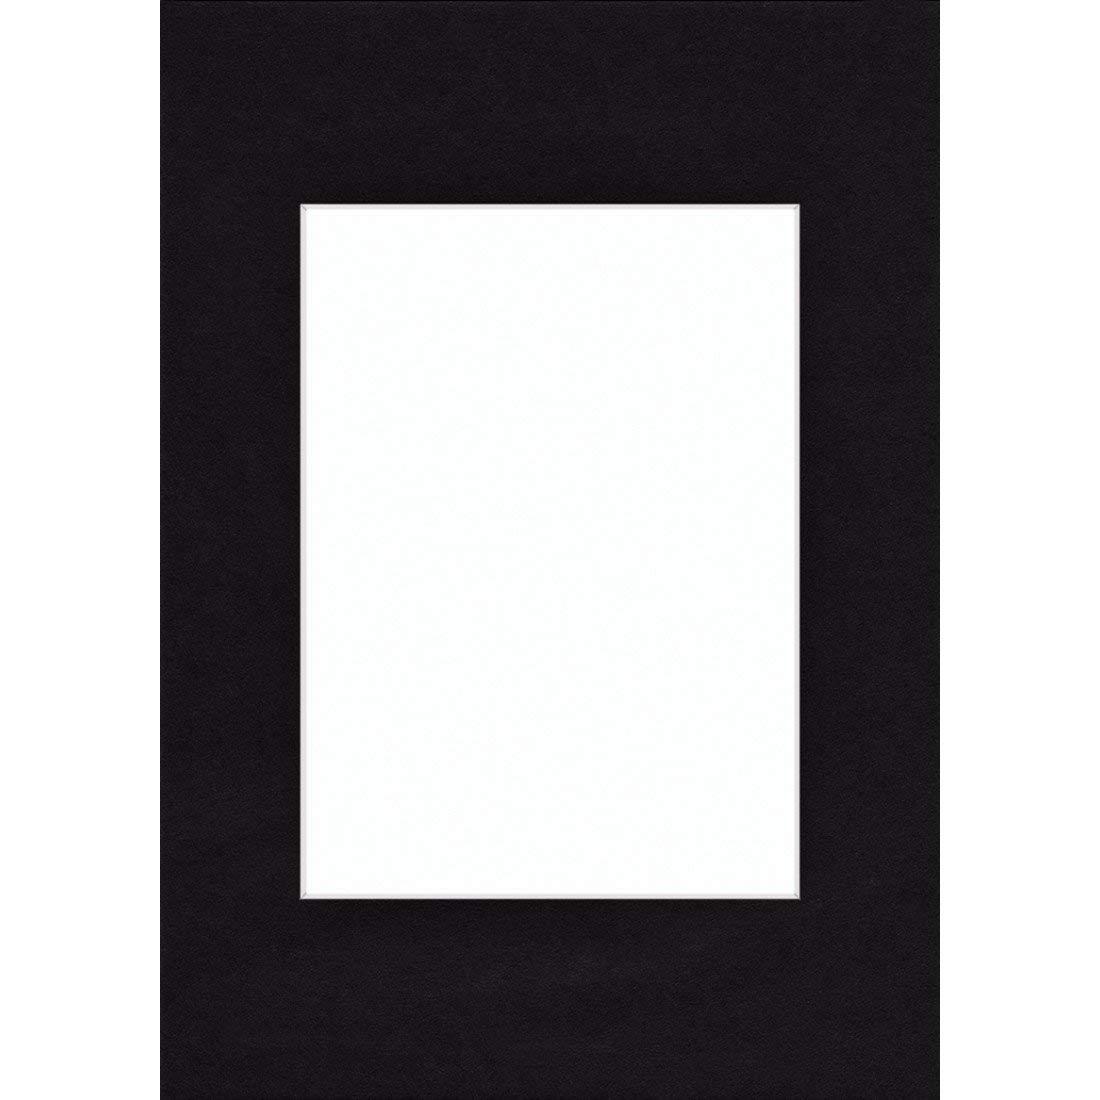 Hama 20 x 30 cm for Photos 13 x 18 cm Snow White Picture Frame Mount